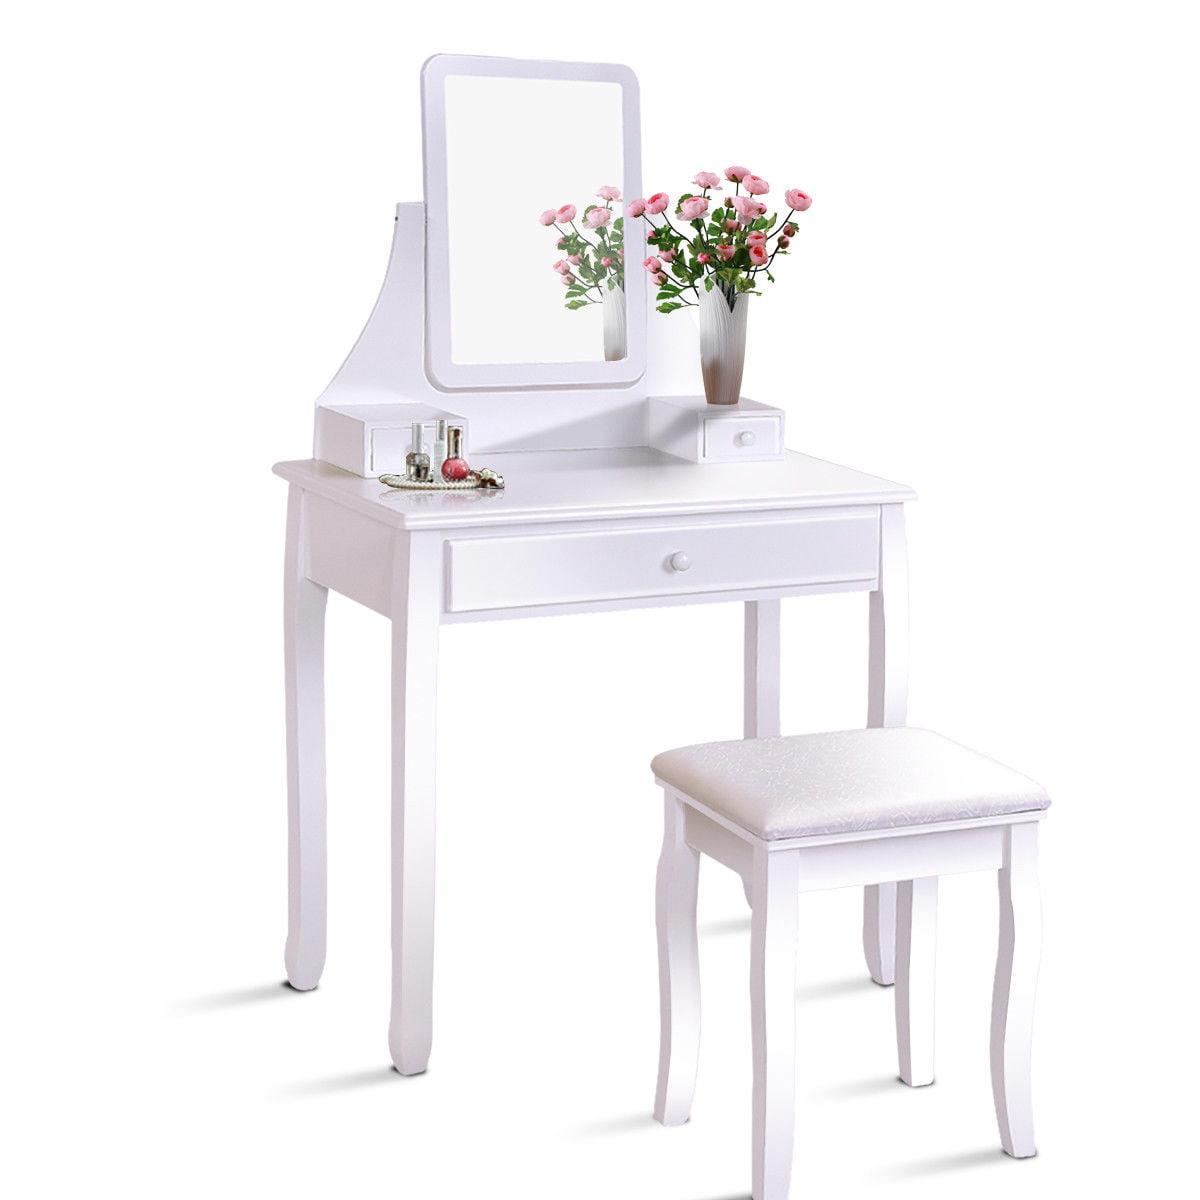 Gymax Bathroom Vanity Dressing Table Set W  3 Storage Boxes by Gymax